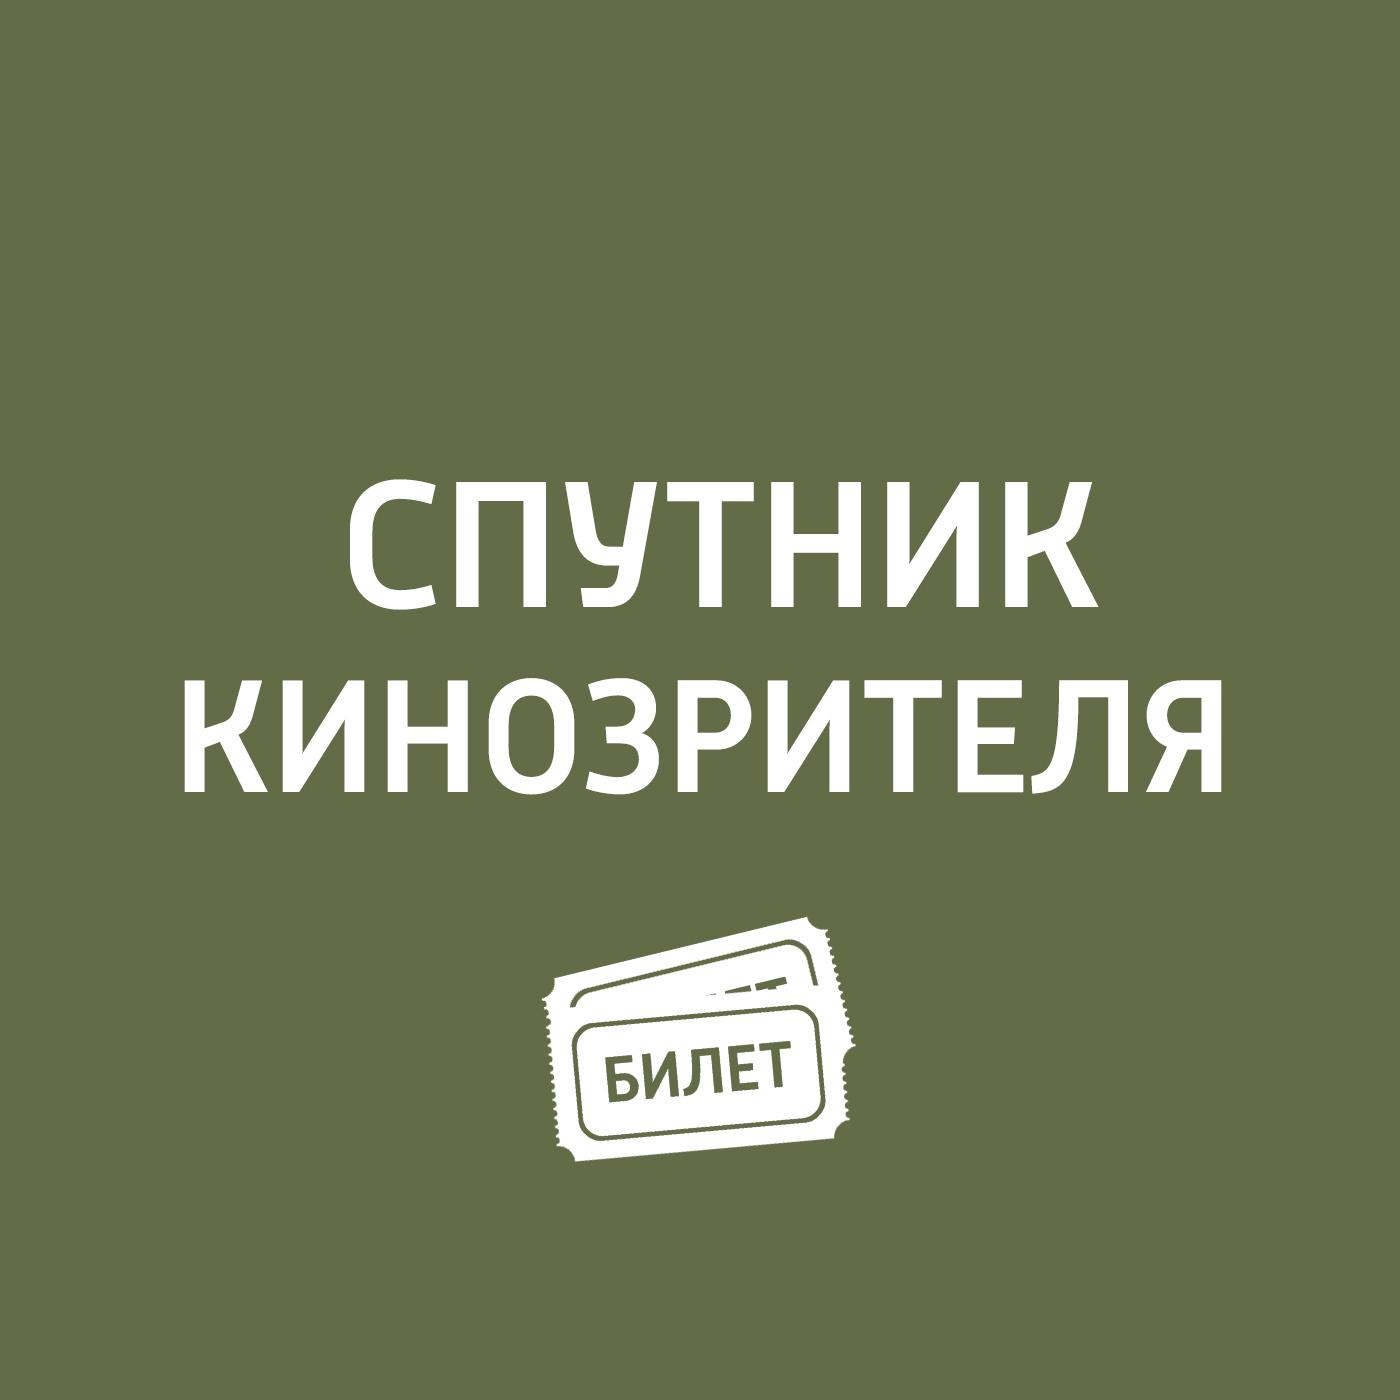 Антон Долин «Кислота», «На районе», «Чёрный клановец» асса